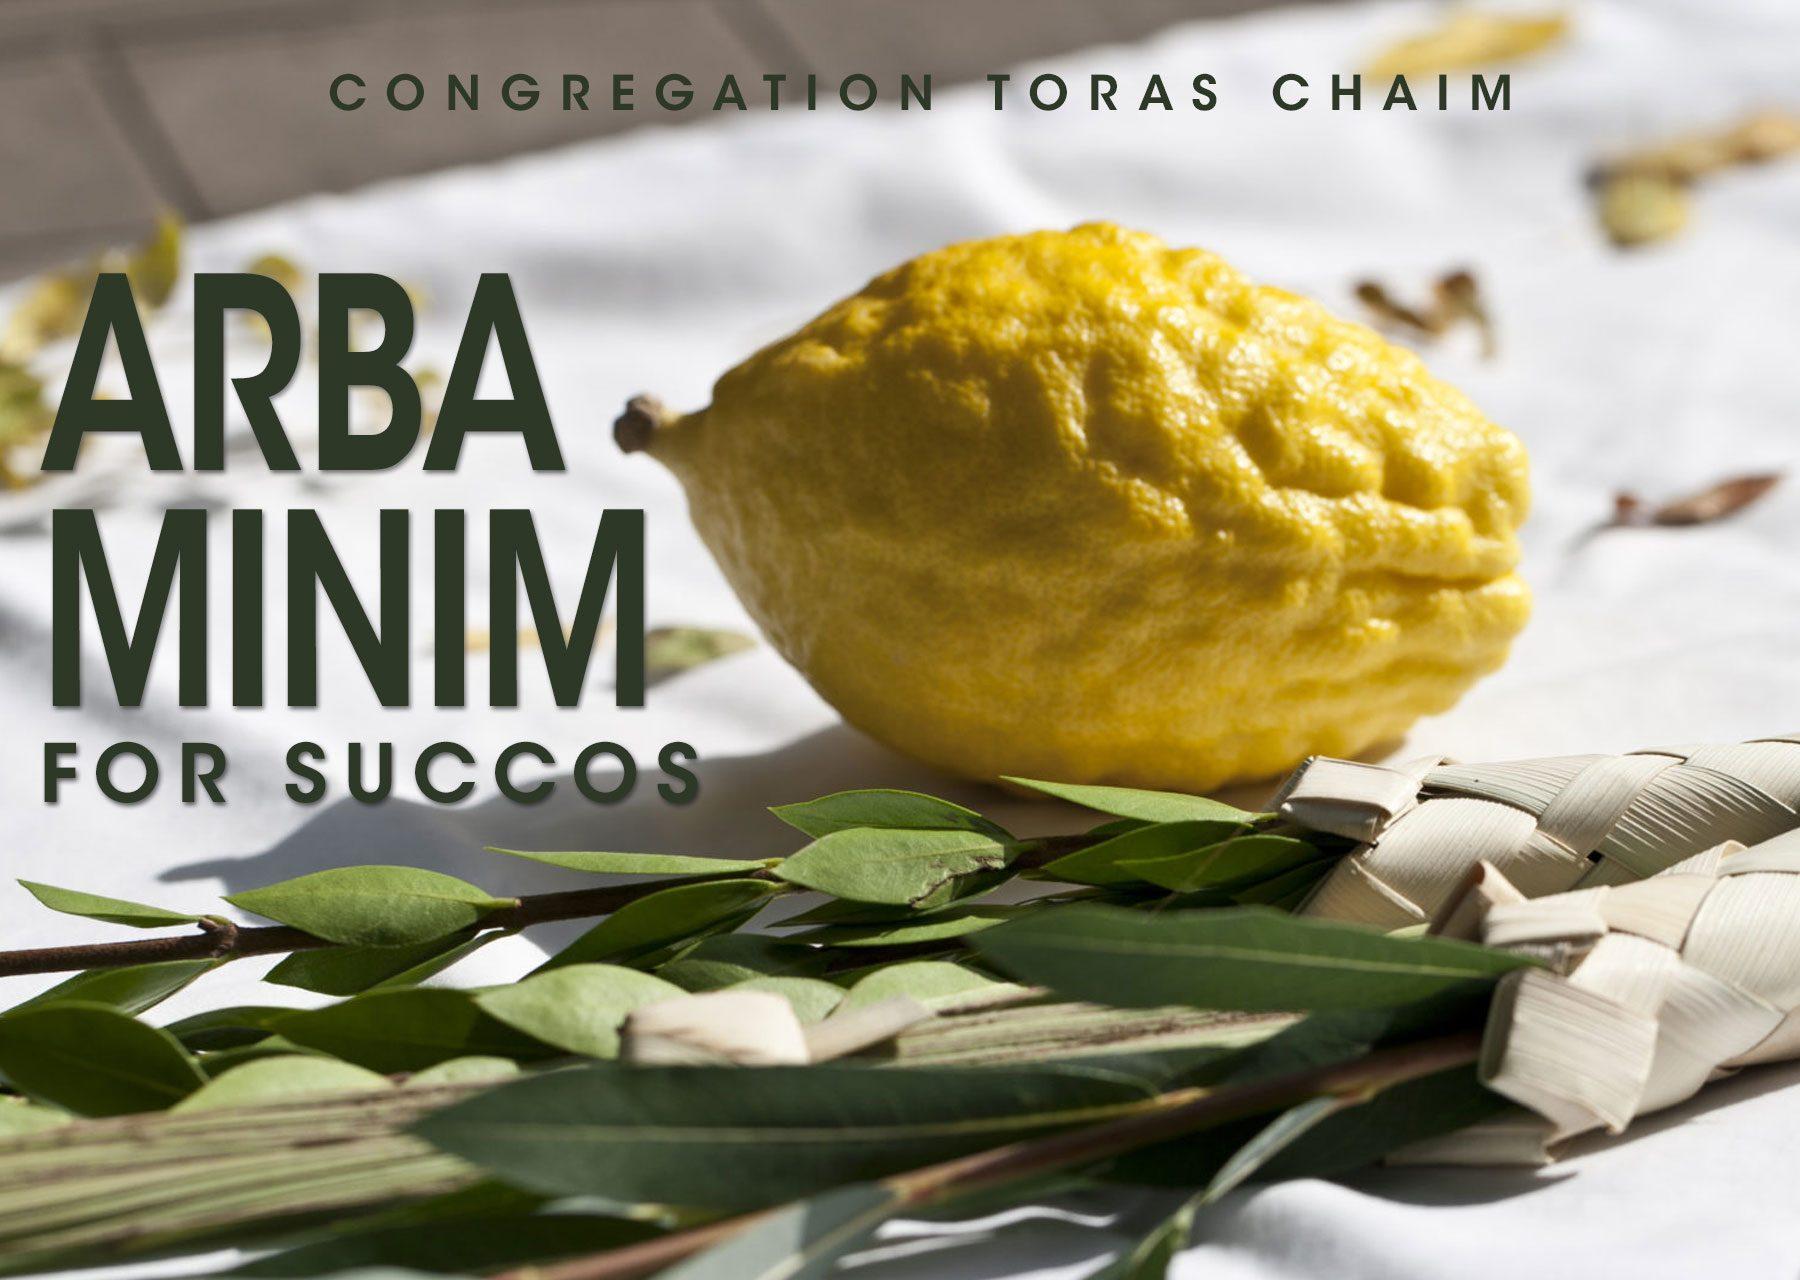 Arba Minim for Succos